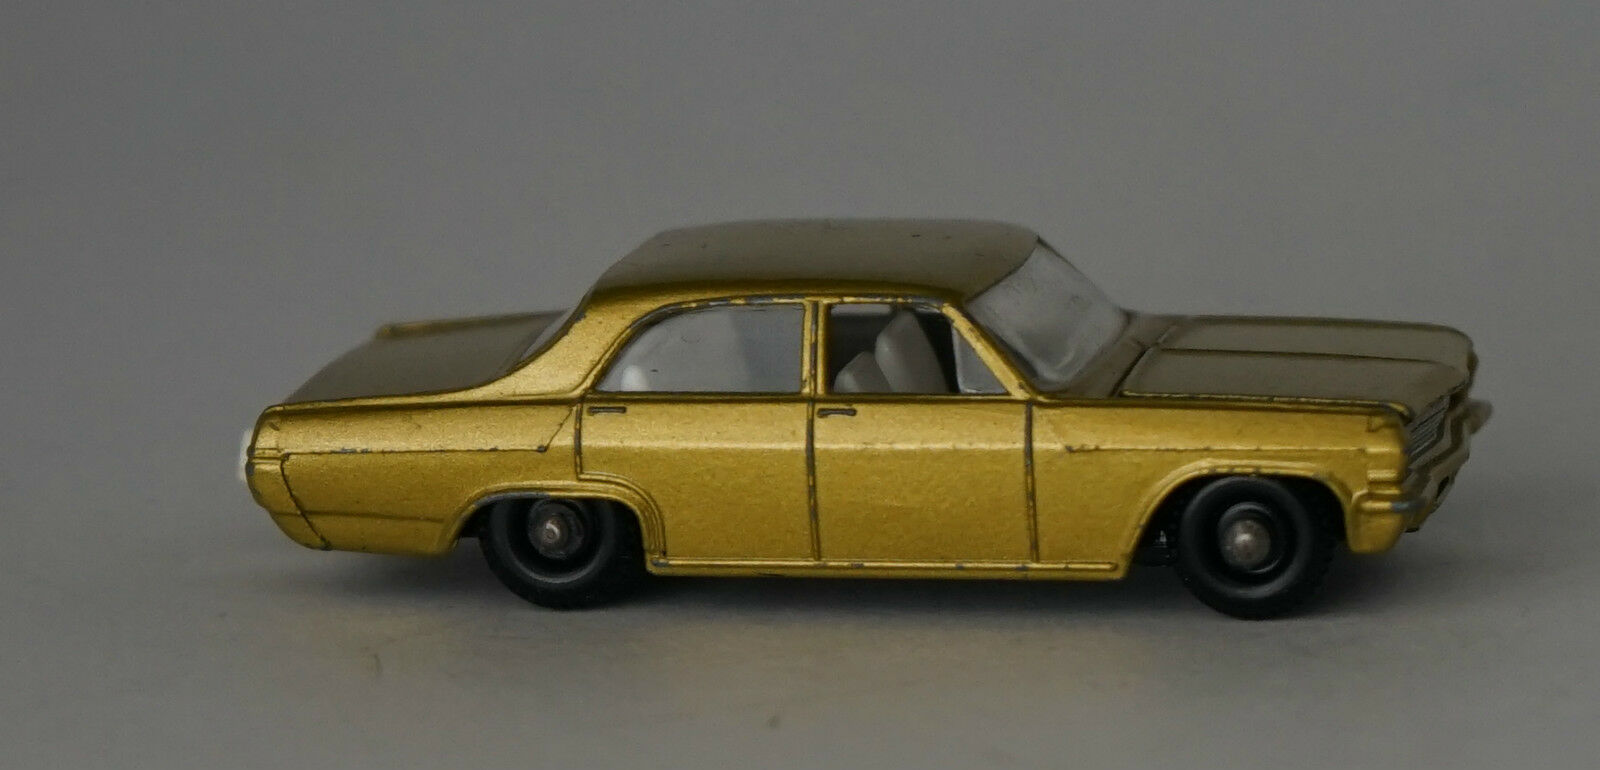 Matchbox Lesney 36c Opel Diplomat BPW, BPW, BPW, With Tow Hook. UNBOXED ddae5f